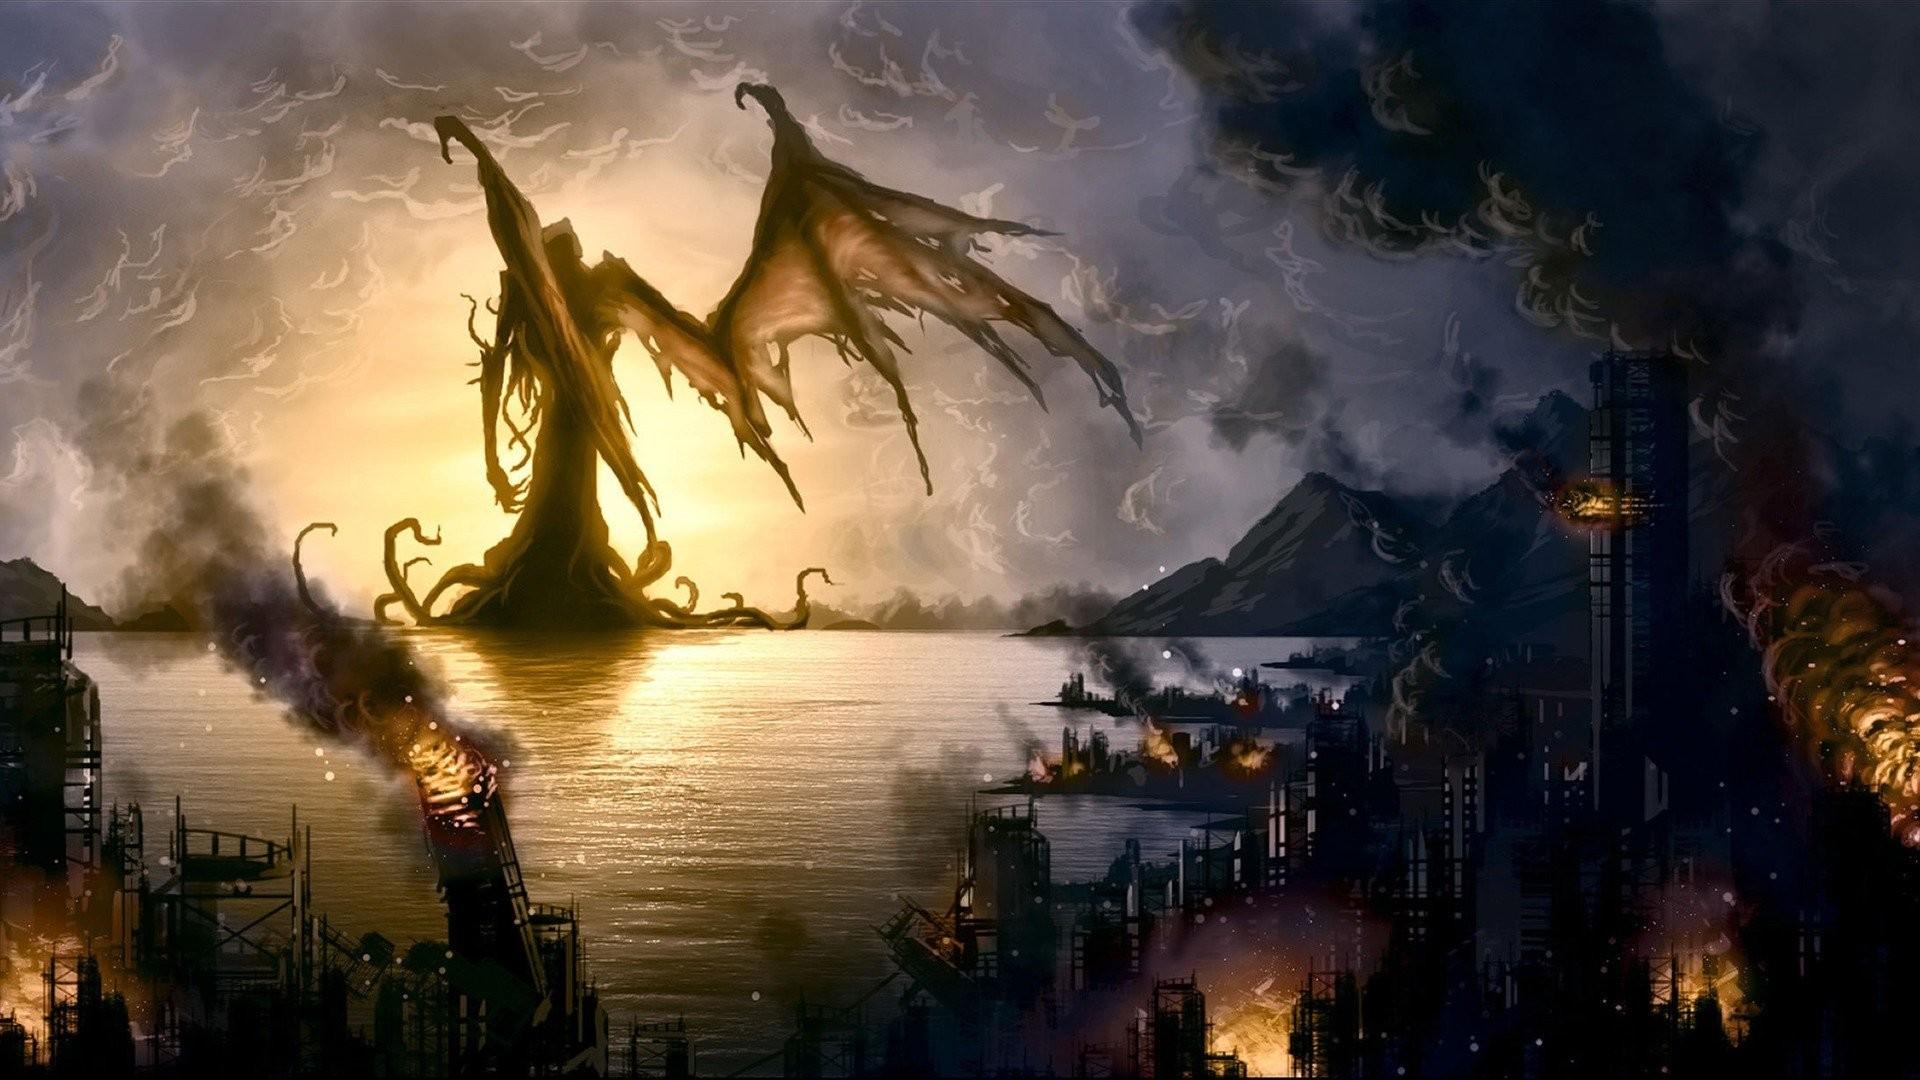 Fantasy – Cthulhu Dark Demon City Wallpaper